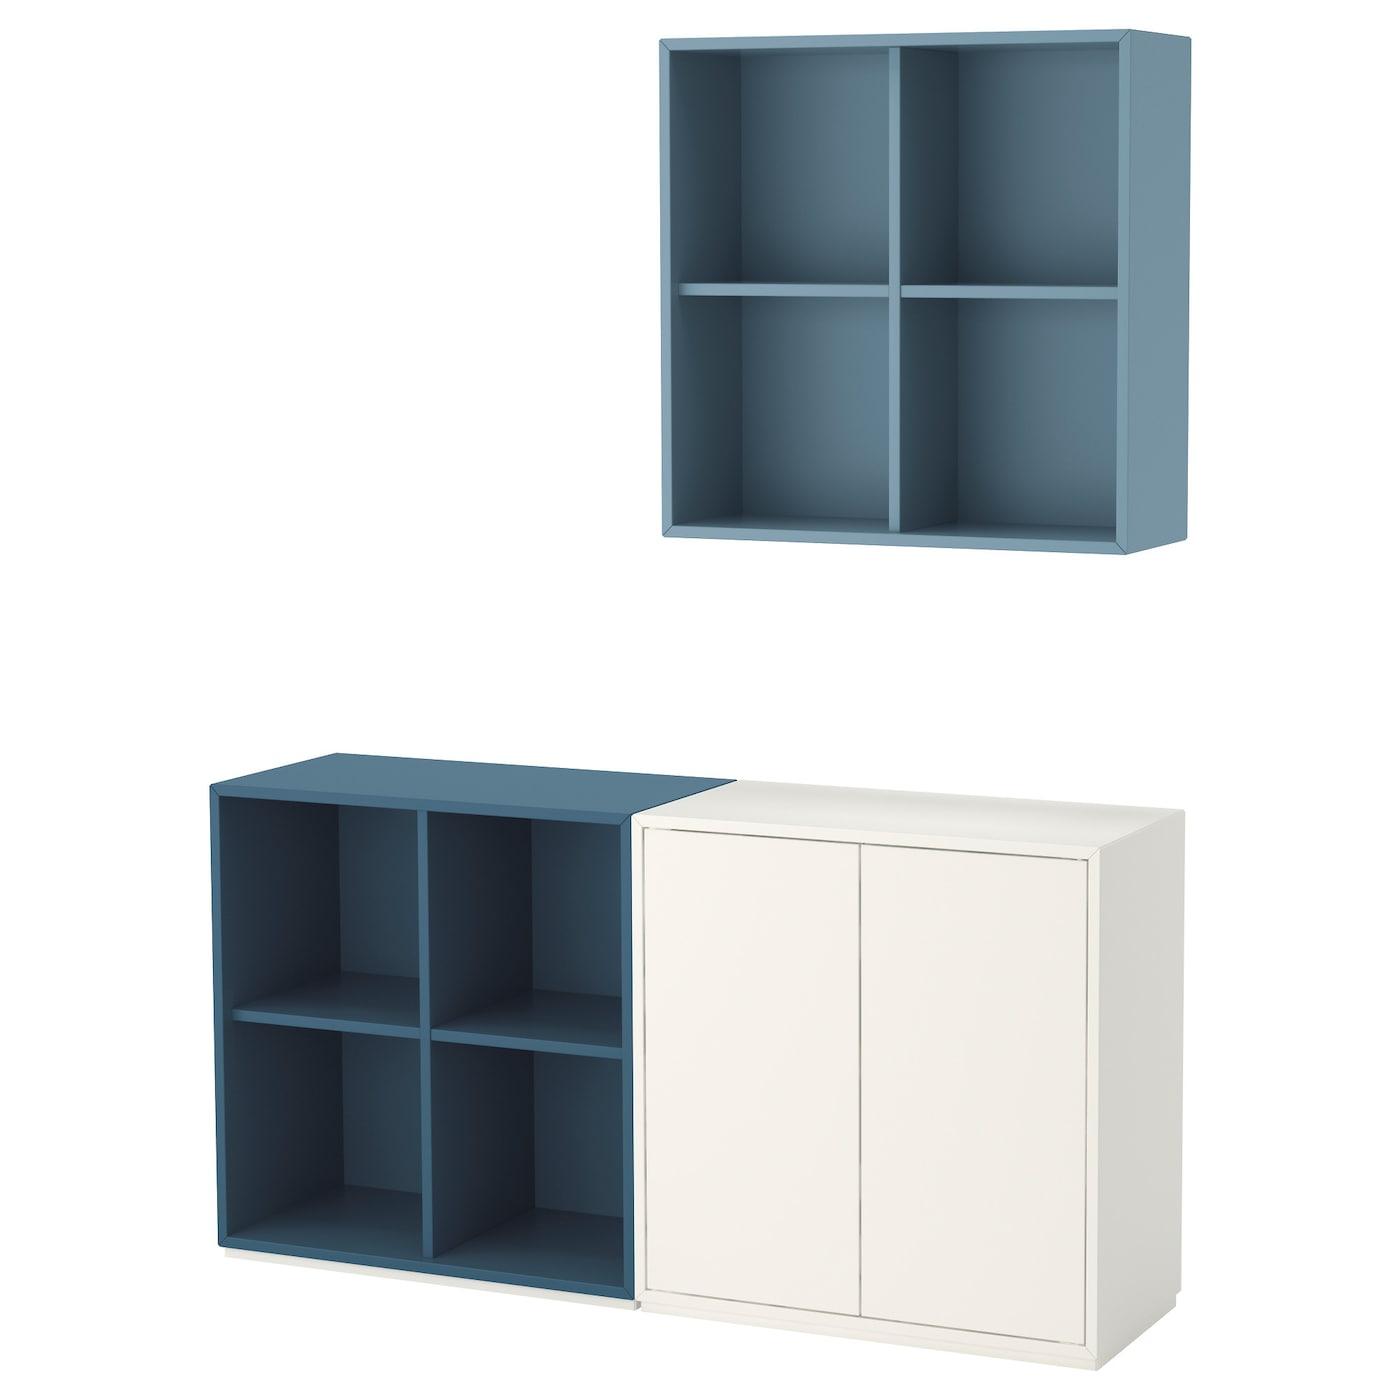 EKET, Schrankkombination/Sockel, weiß/hellblau weiß/hellgrau, weiß/hellgrau 791.908.89